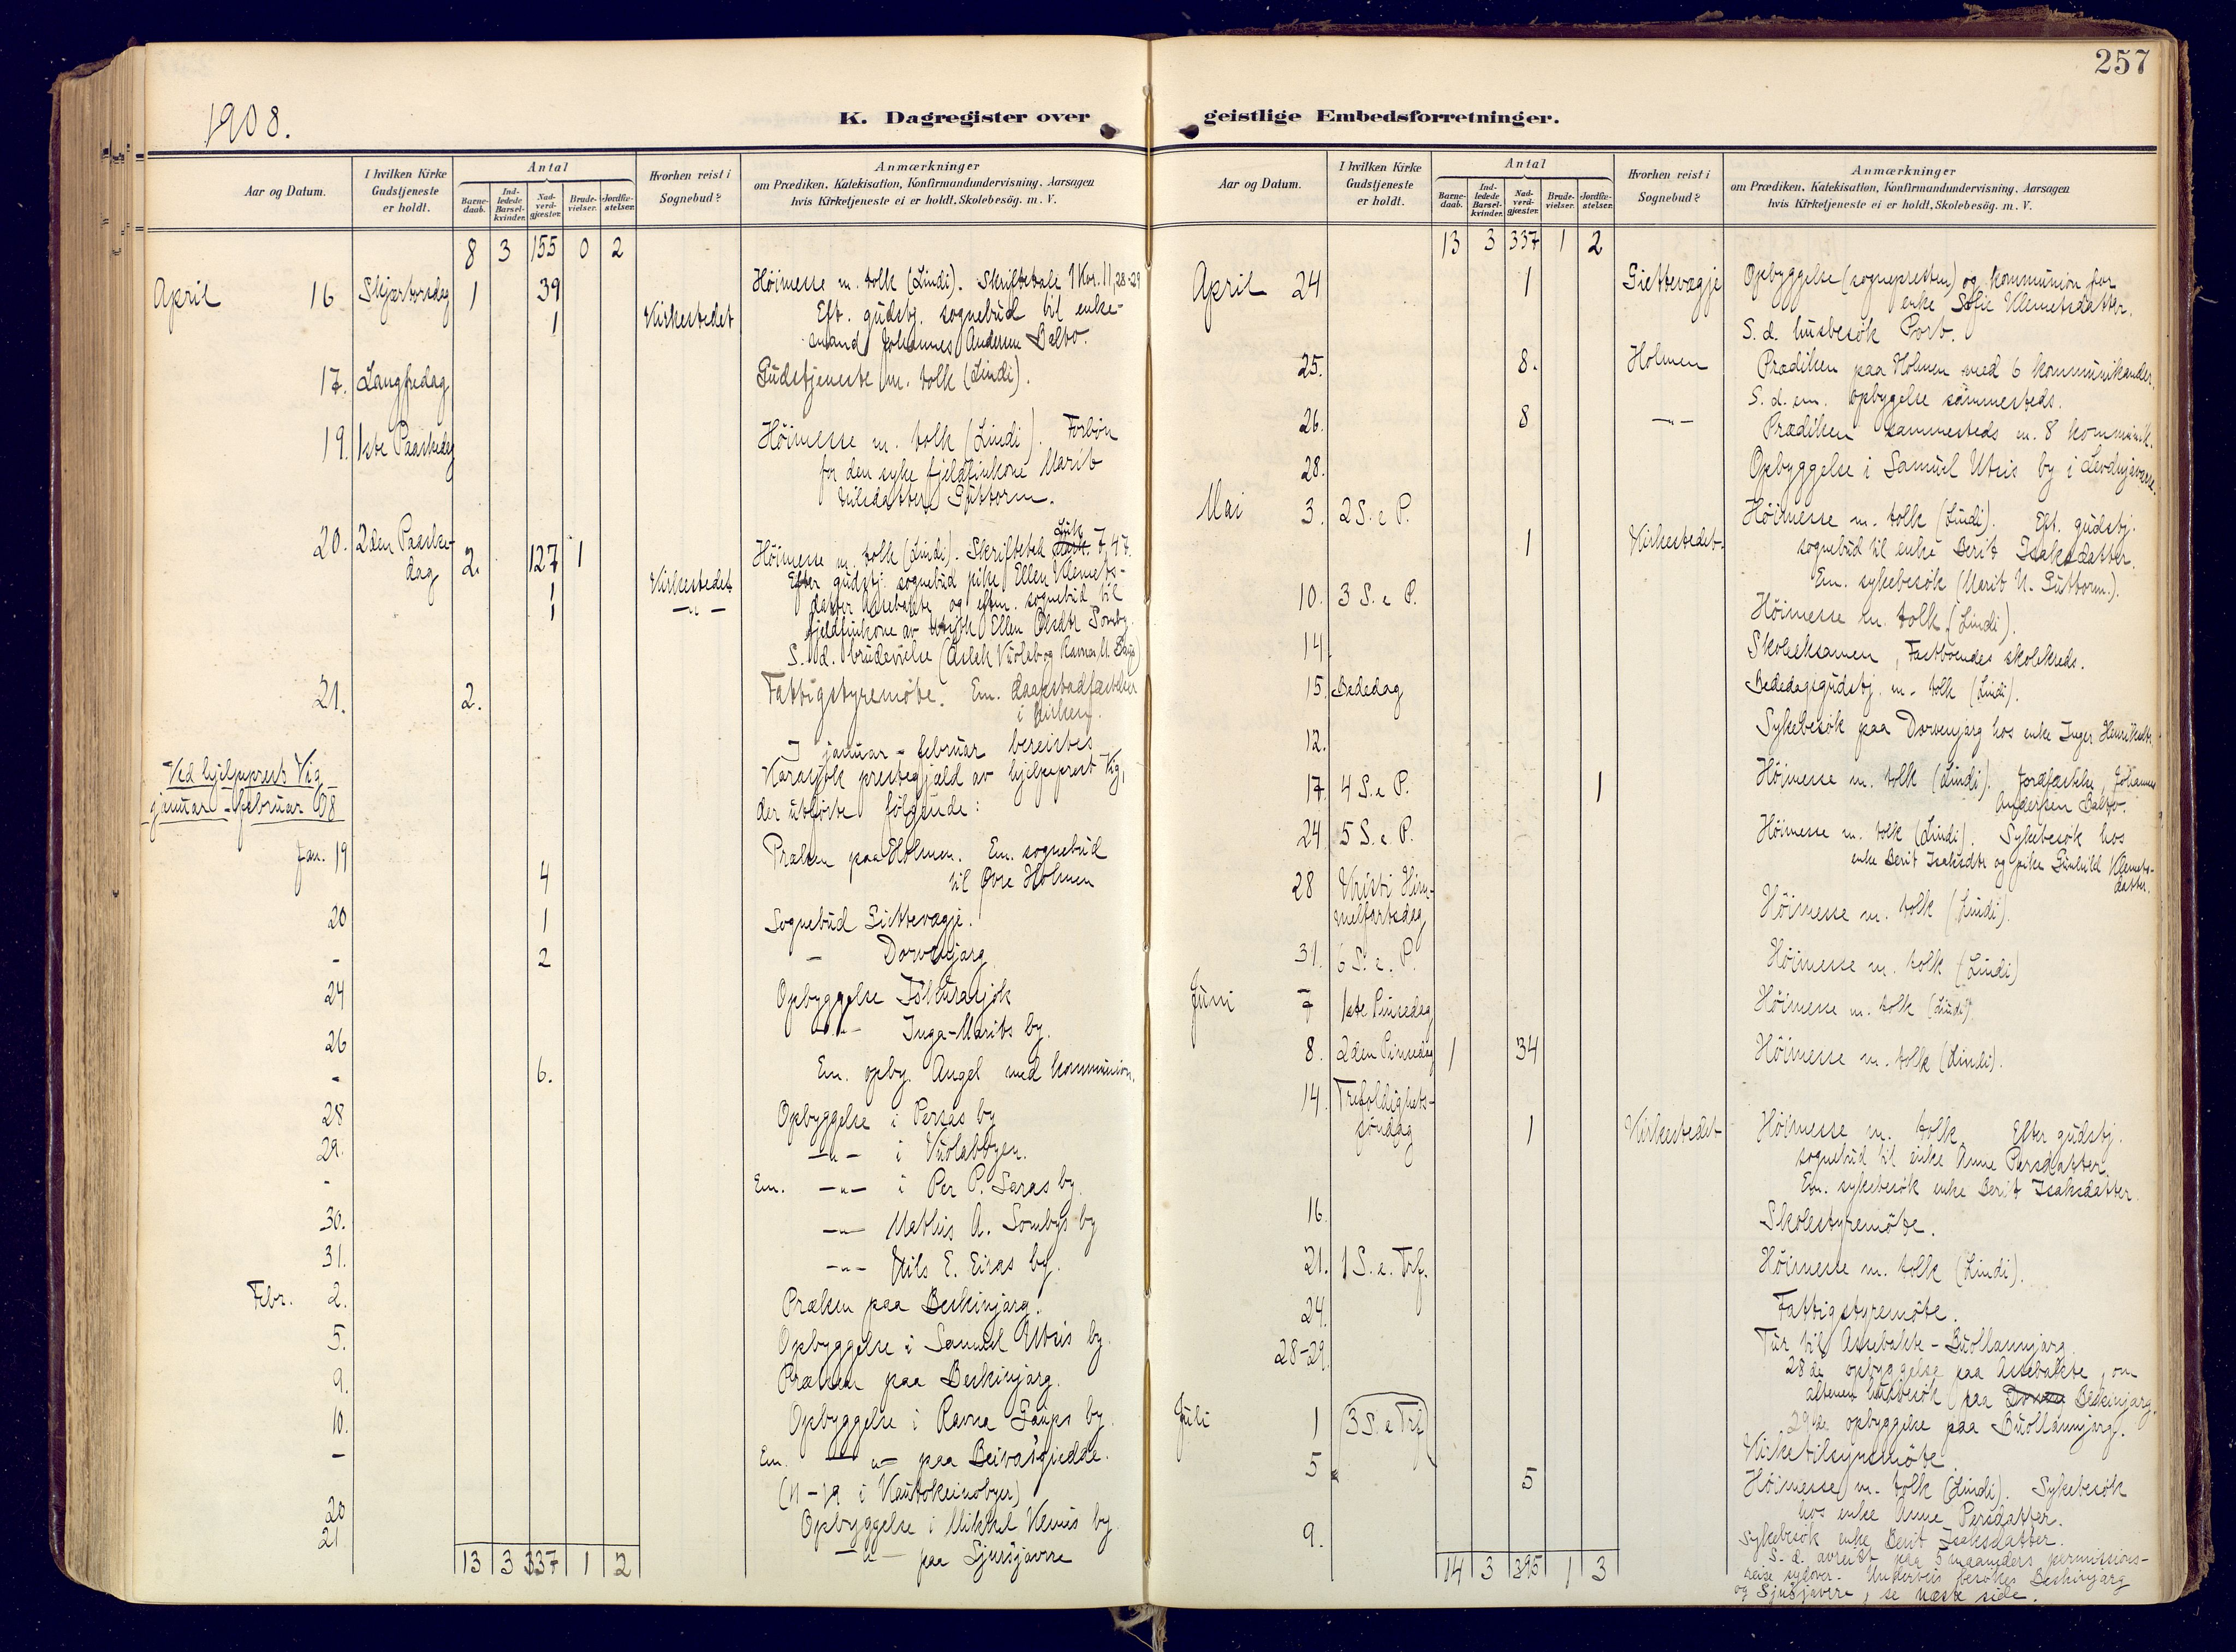 SATØ, Karasjok sokneprestkontor, H/Ha: Ministerialbok nr. 3, 1907-1926, s. 257